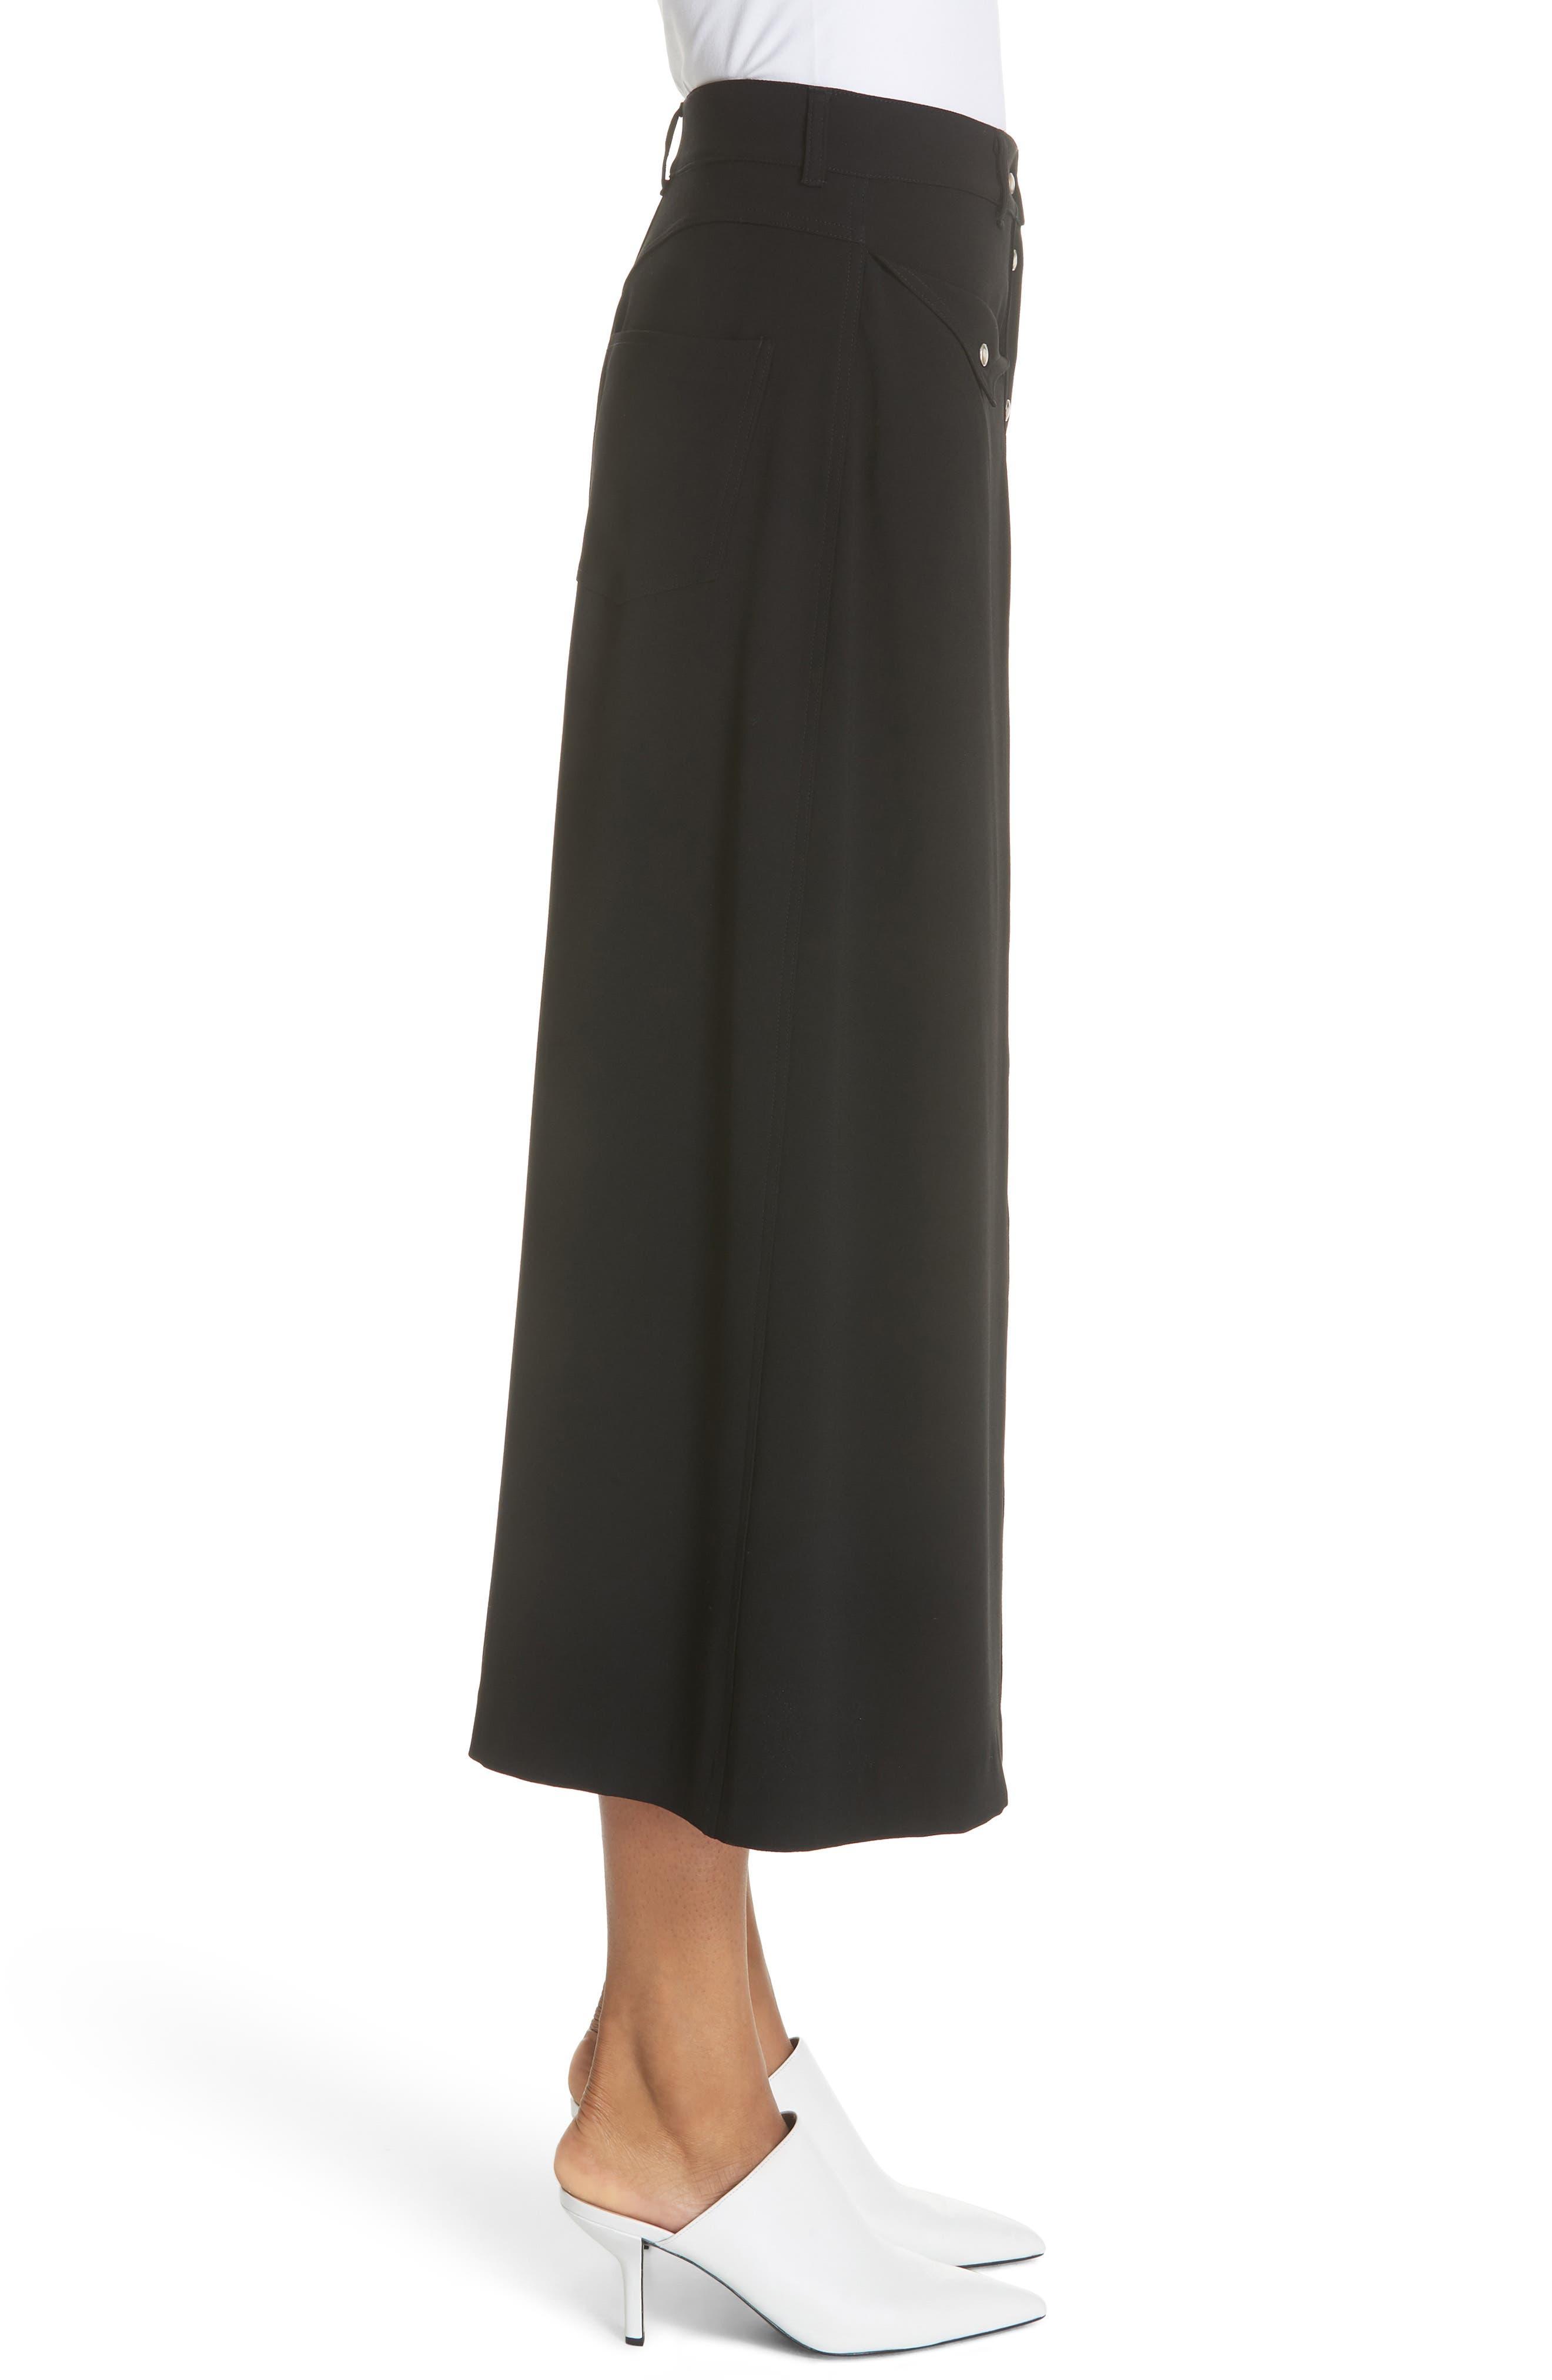 Meida Midi Skirt,                             Alternate thumbnail 3, color,                             003